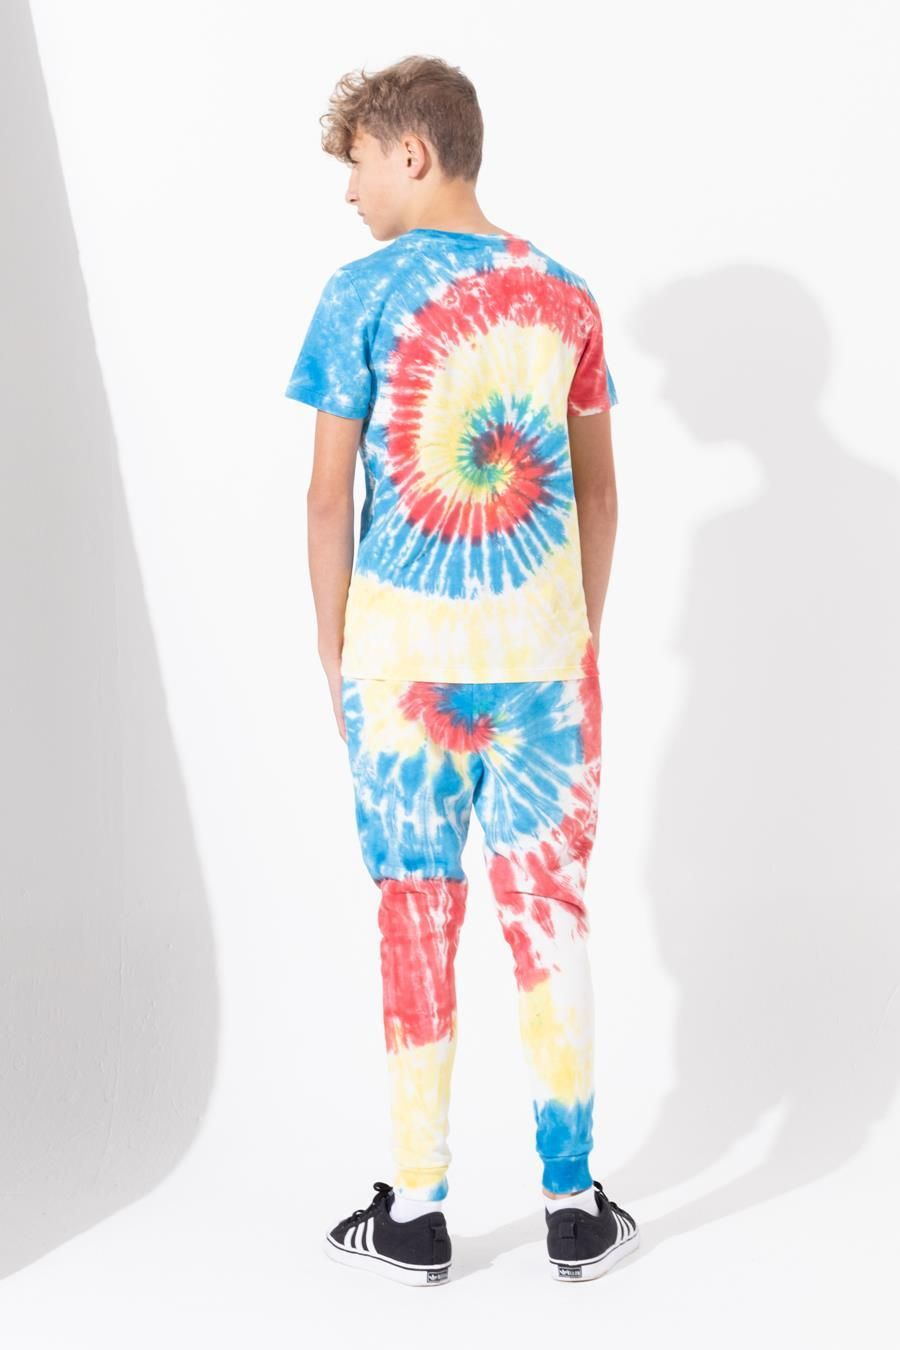 Hype Tie Dye Kids T-Shirt